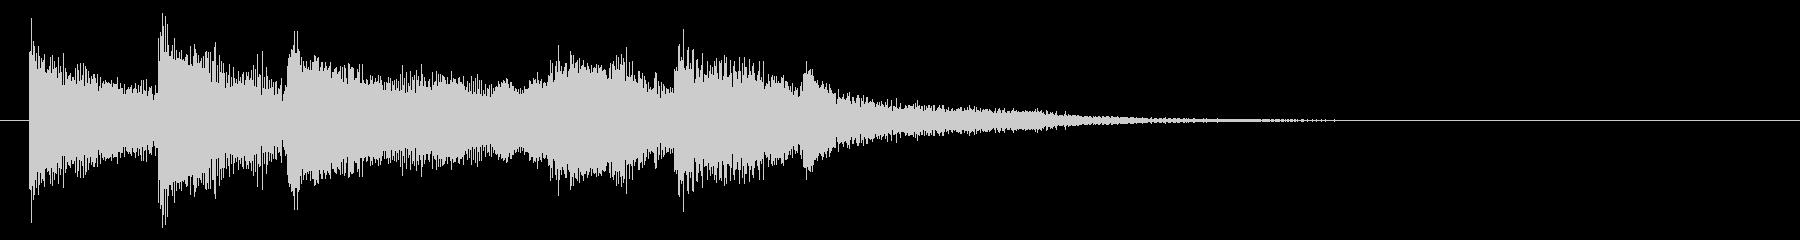 BPM145 ピアノとシンセのジングルの未再生の波形